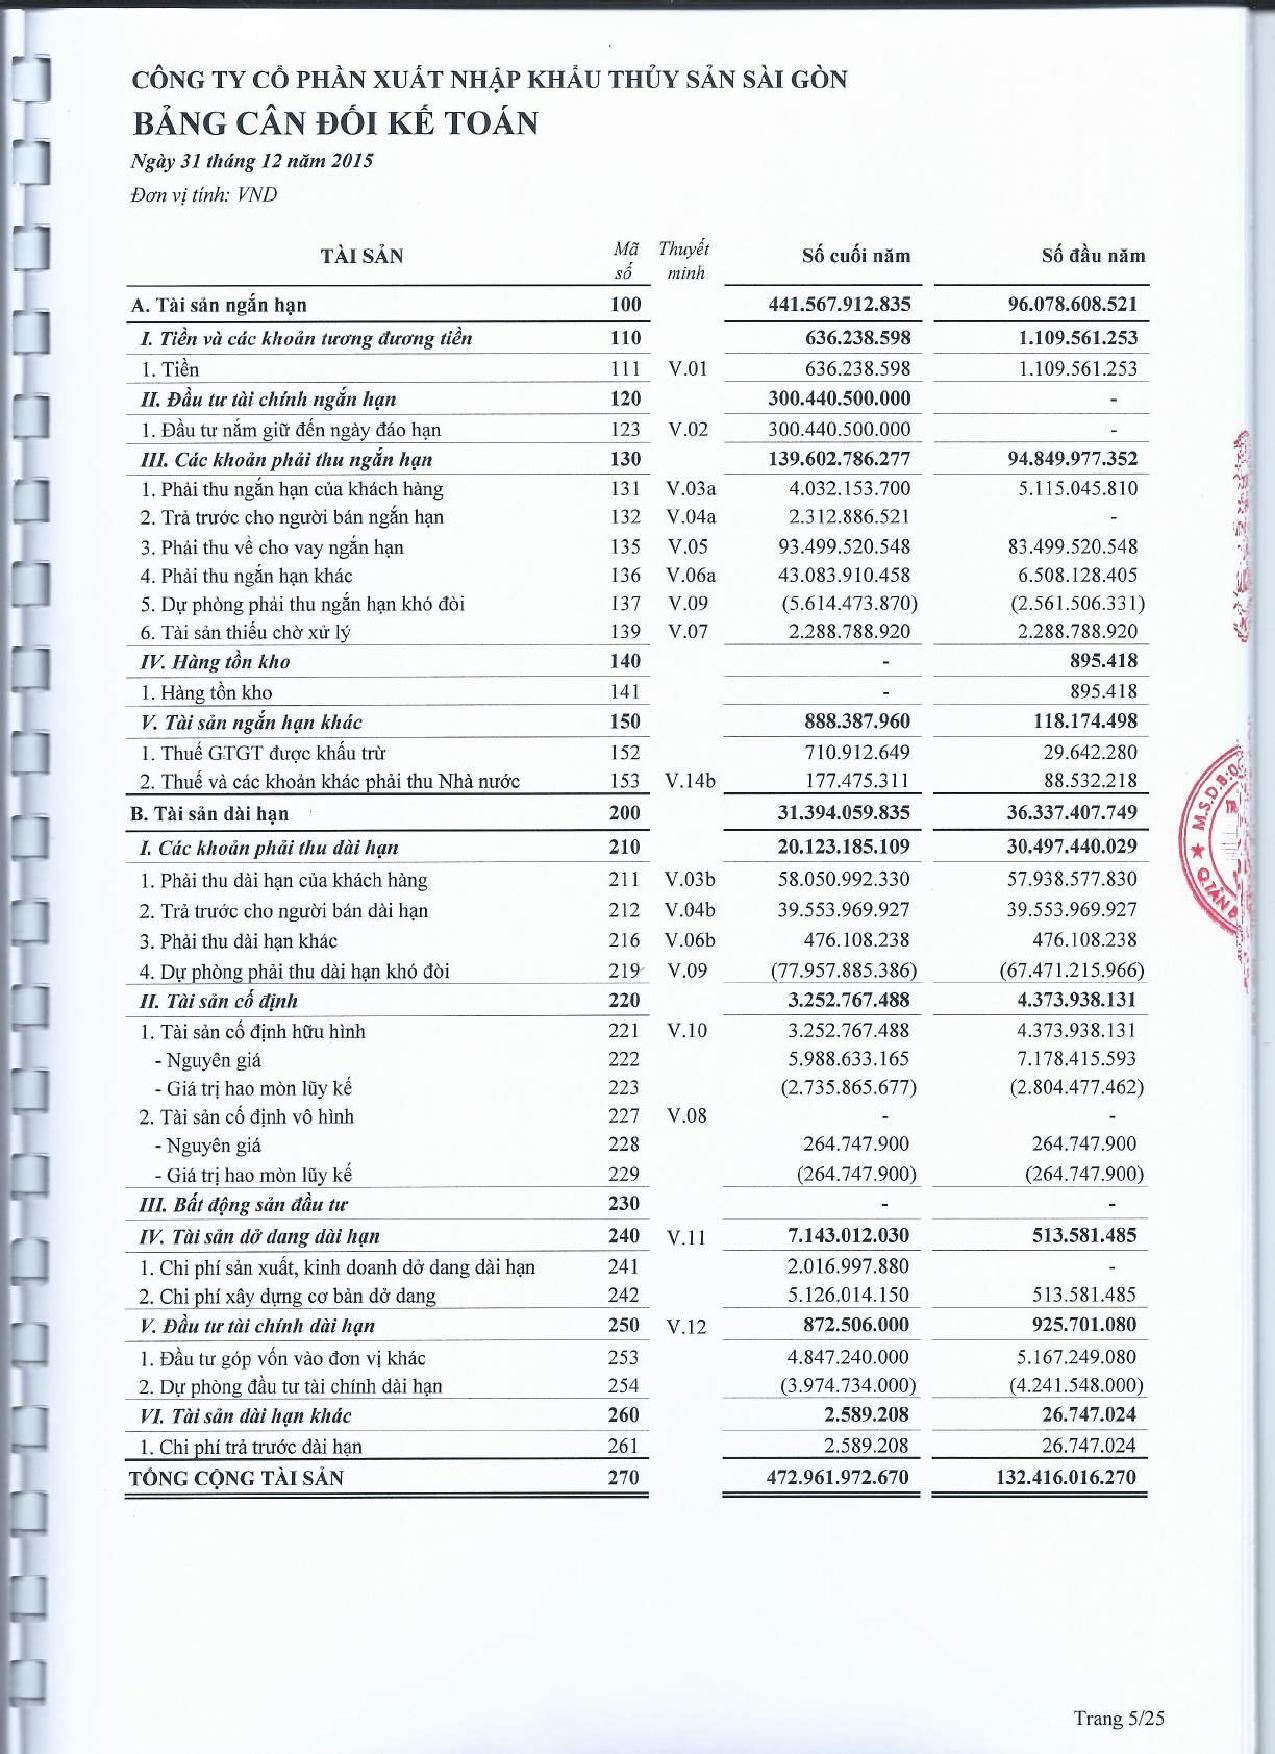 1342016915_BTCTKT-2015-SeaprodexSaigon.compressed-page-007